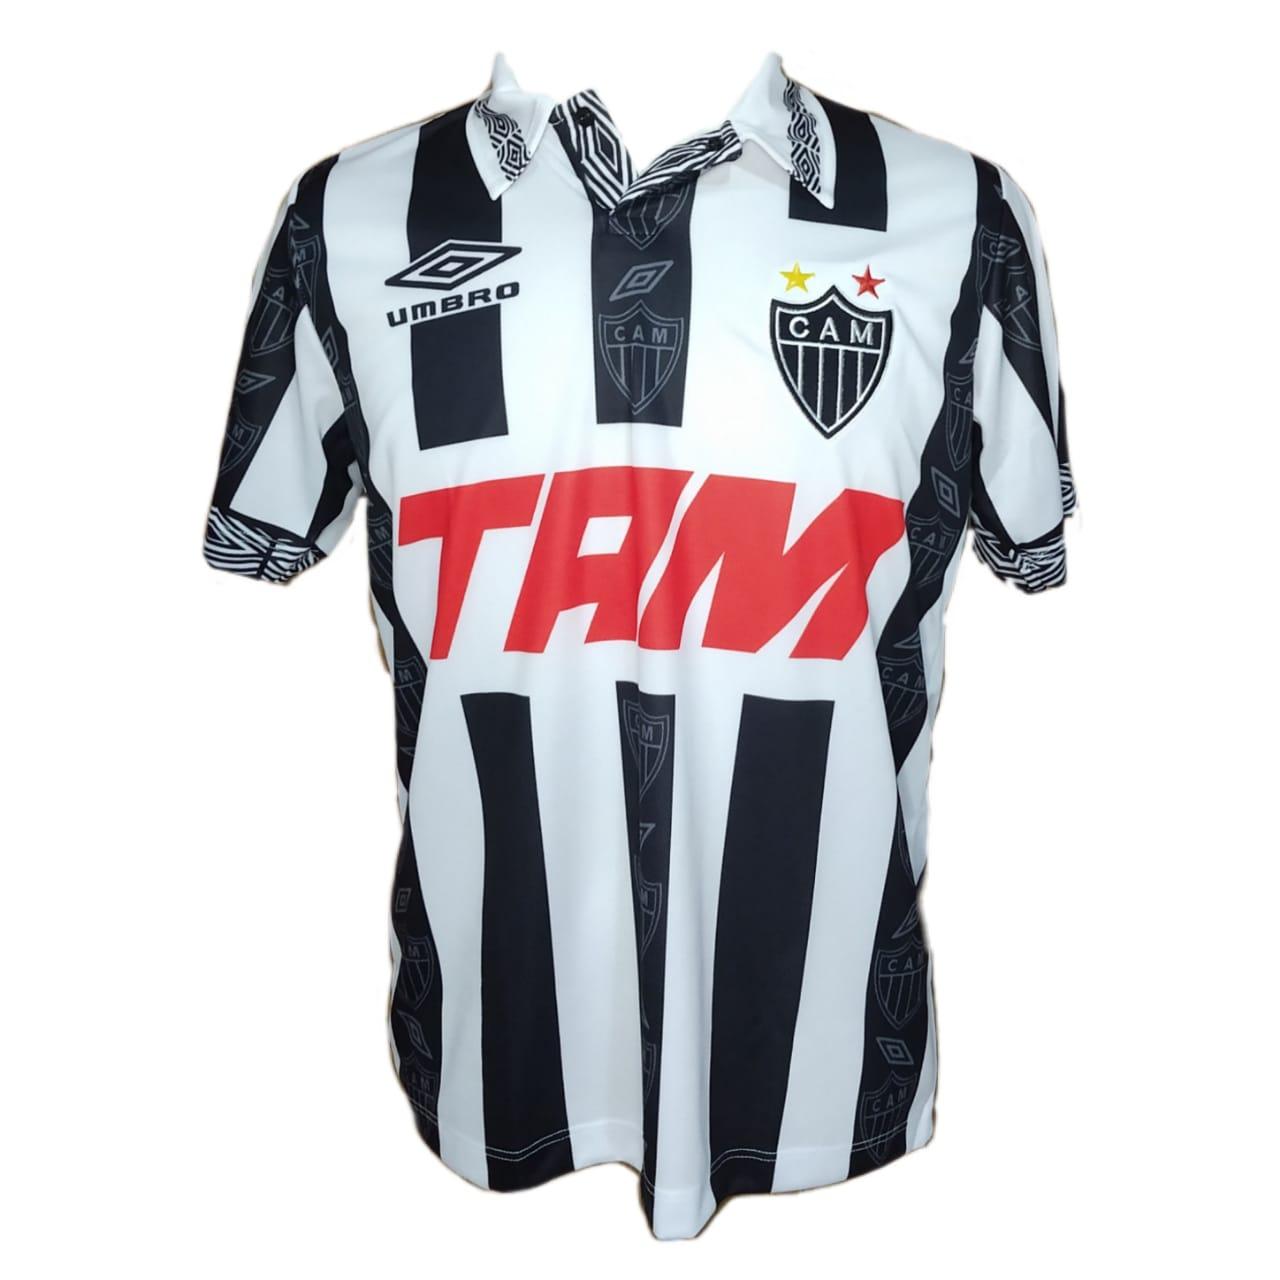 Camisa Atletico Mg Retro 1996 Blusa Galo Retro 1996 Fut Retro